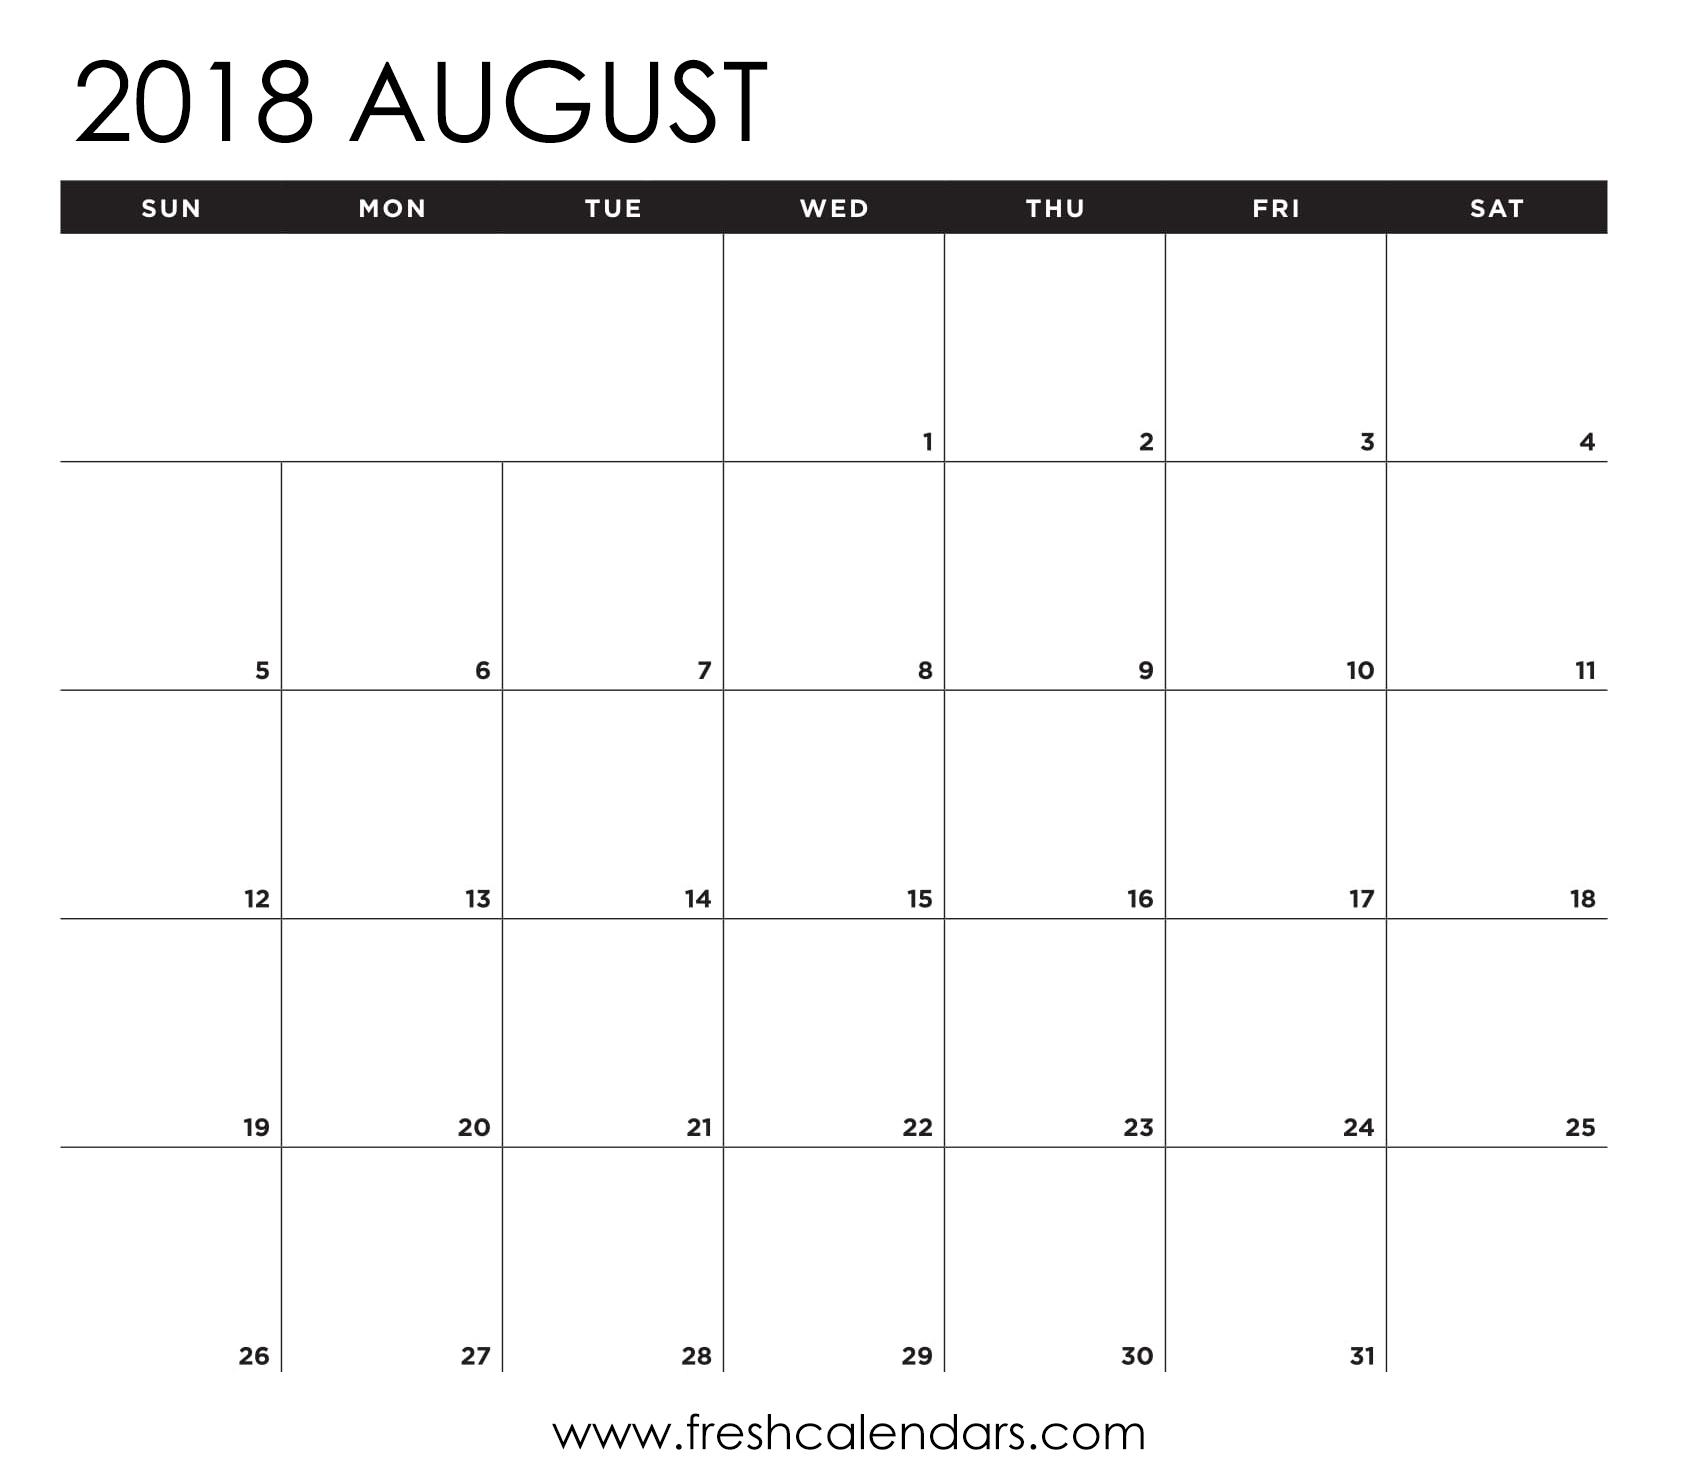 August 2018 Calendar Printable - Fresh Calendars inside Blank Calendar Printable August